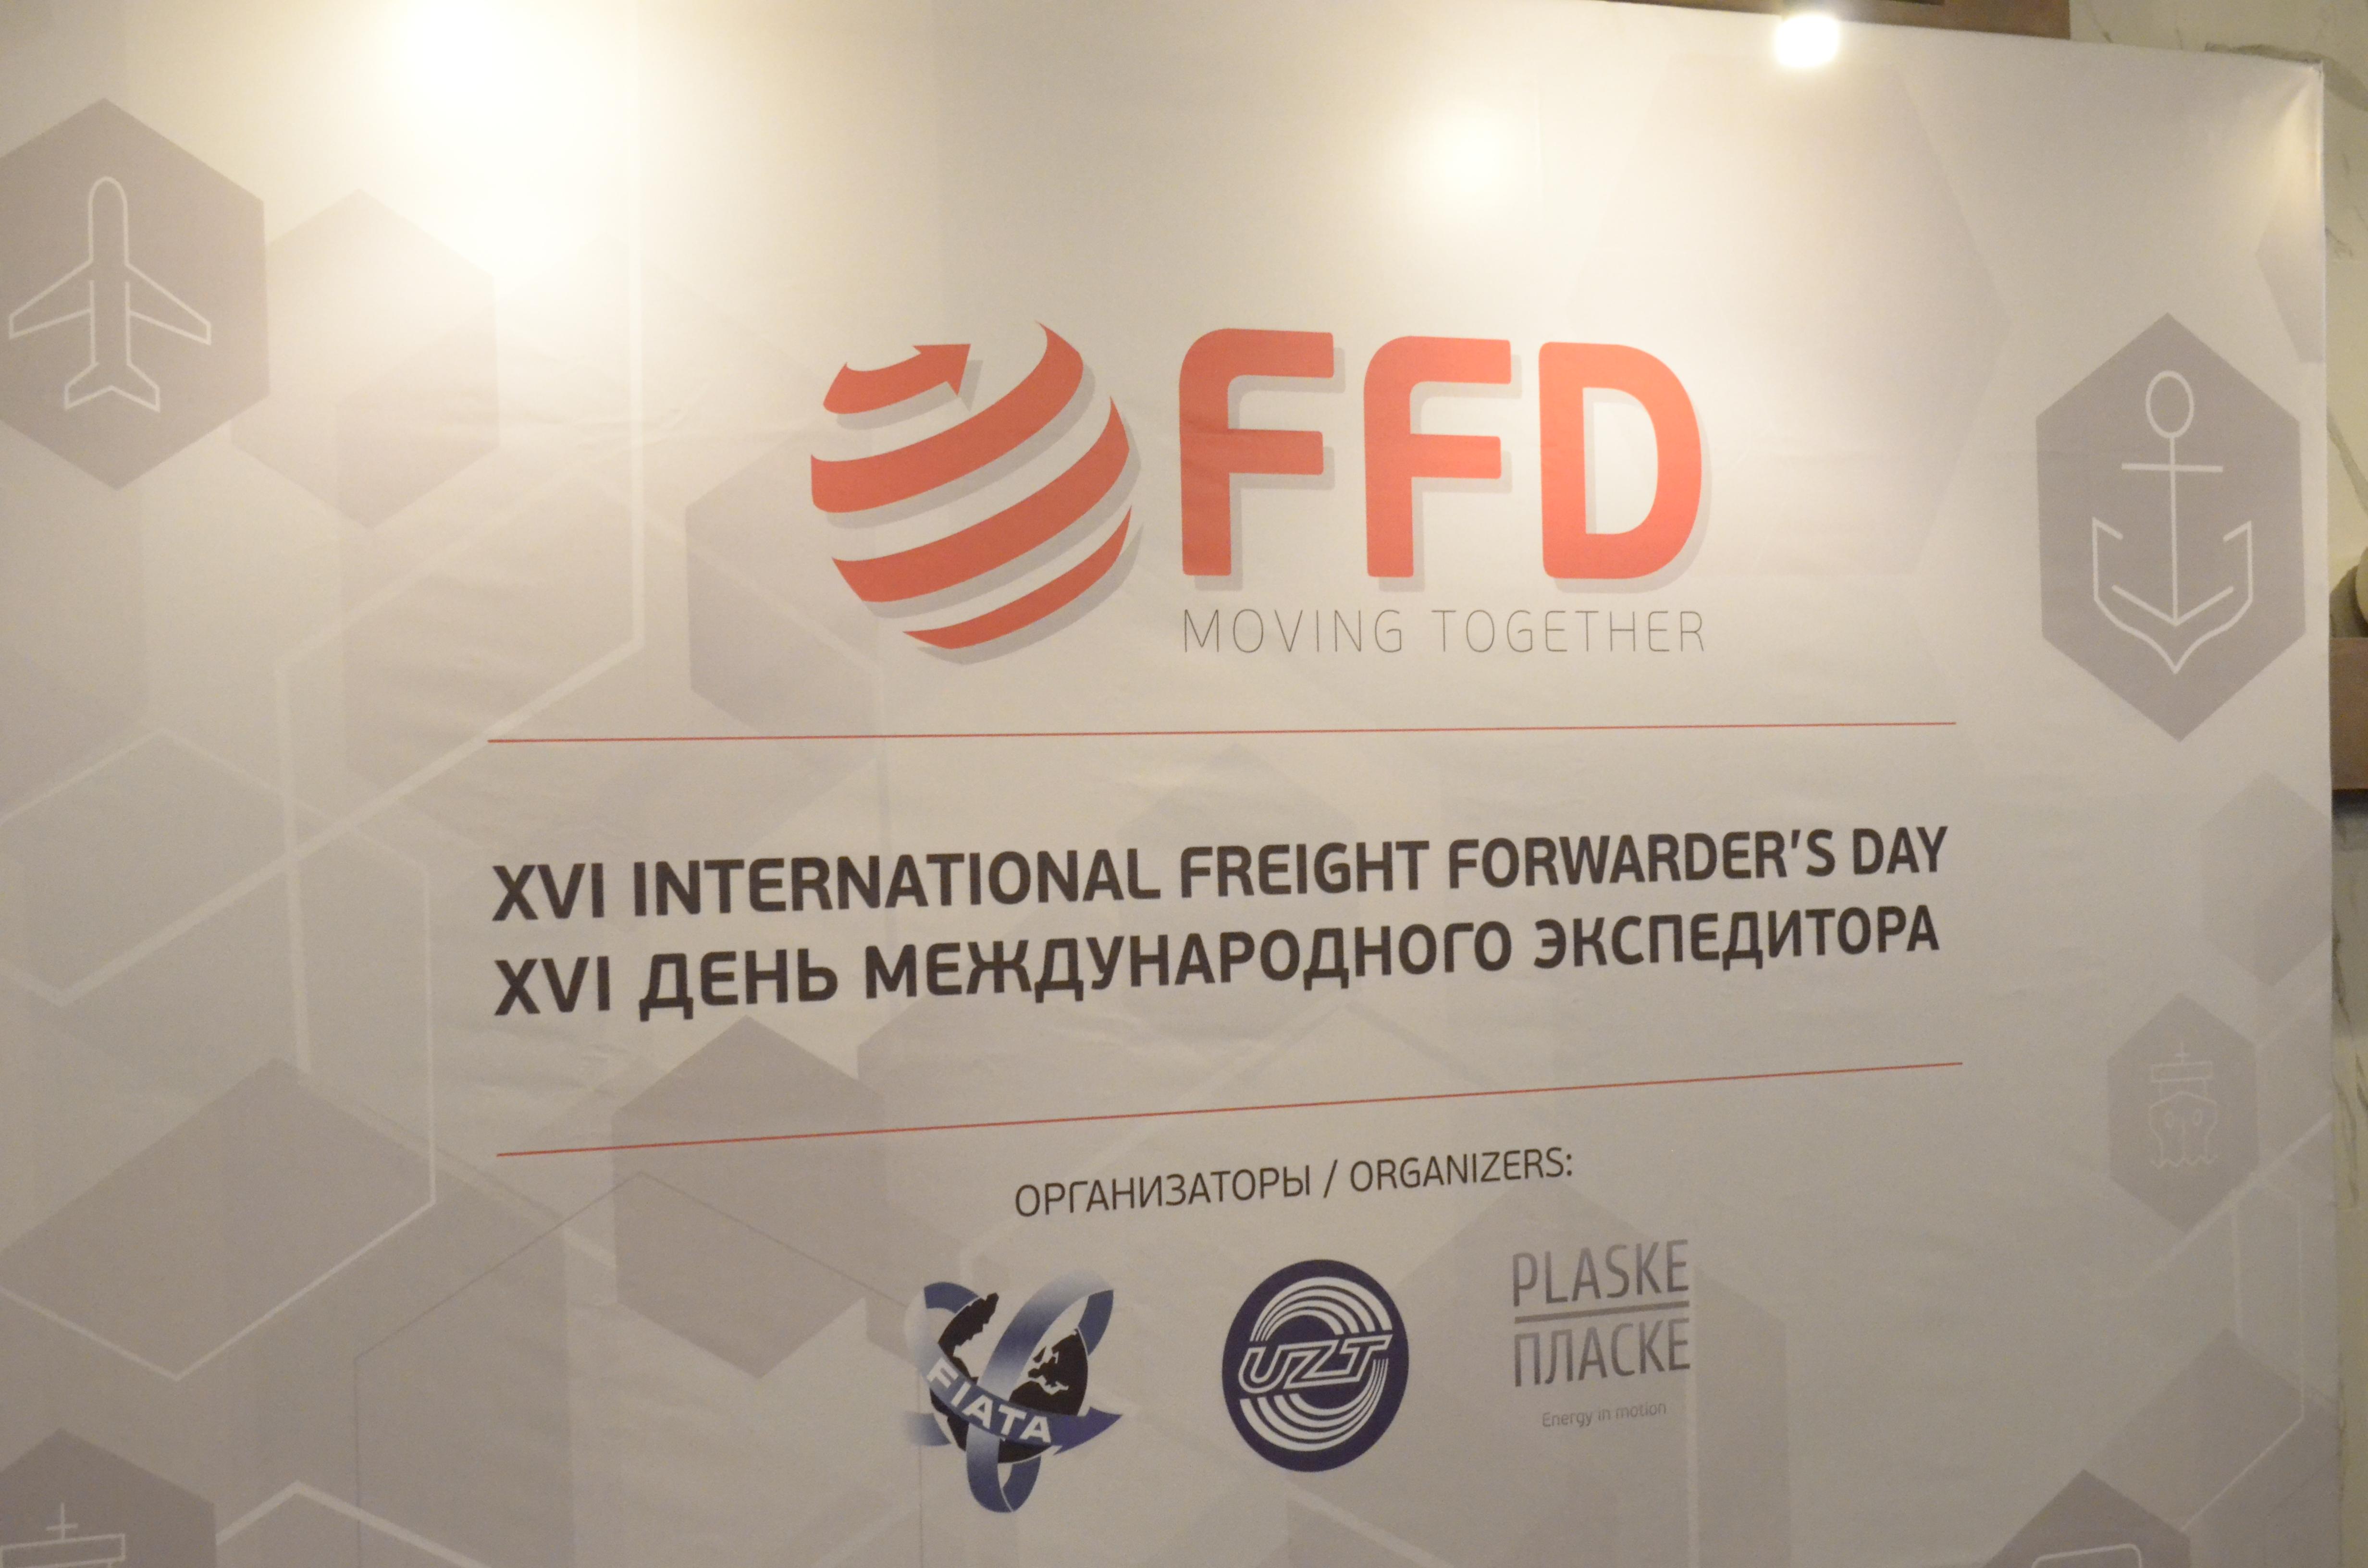 XVI International Freight Forwarder Day